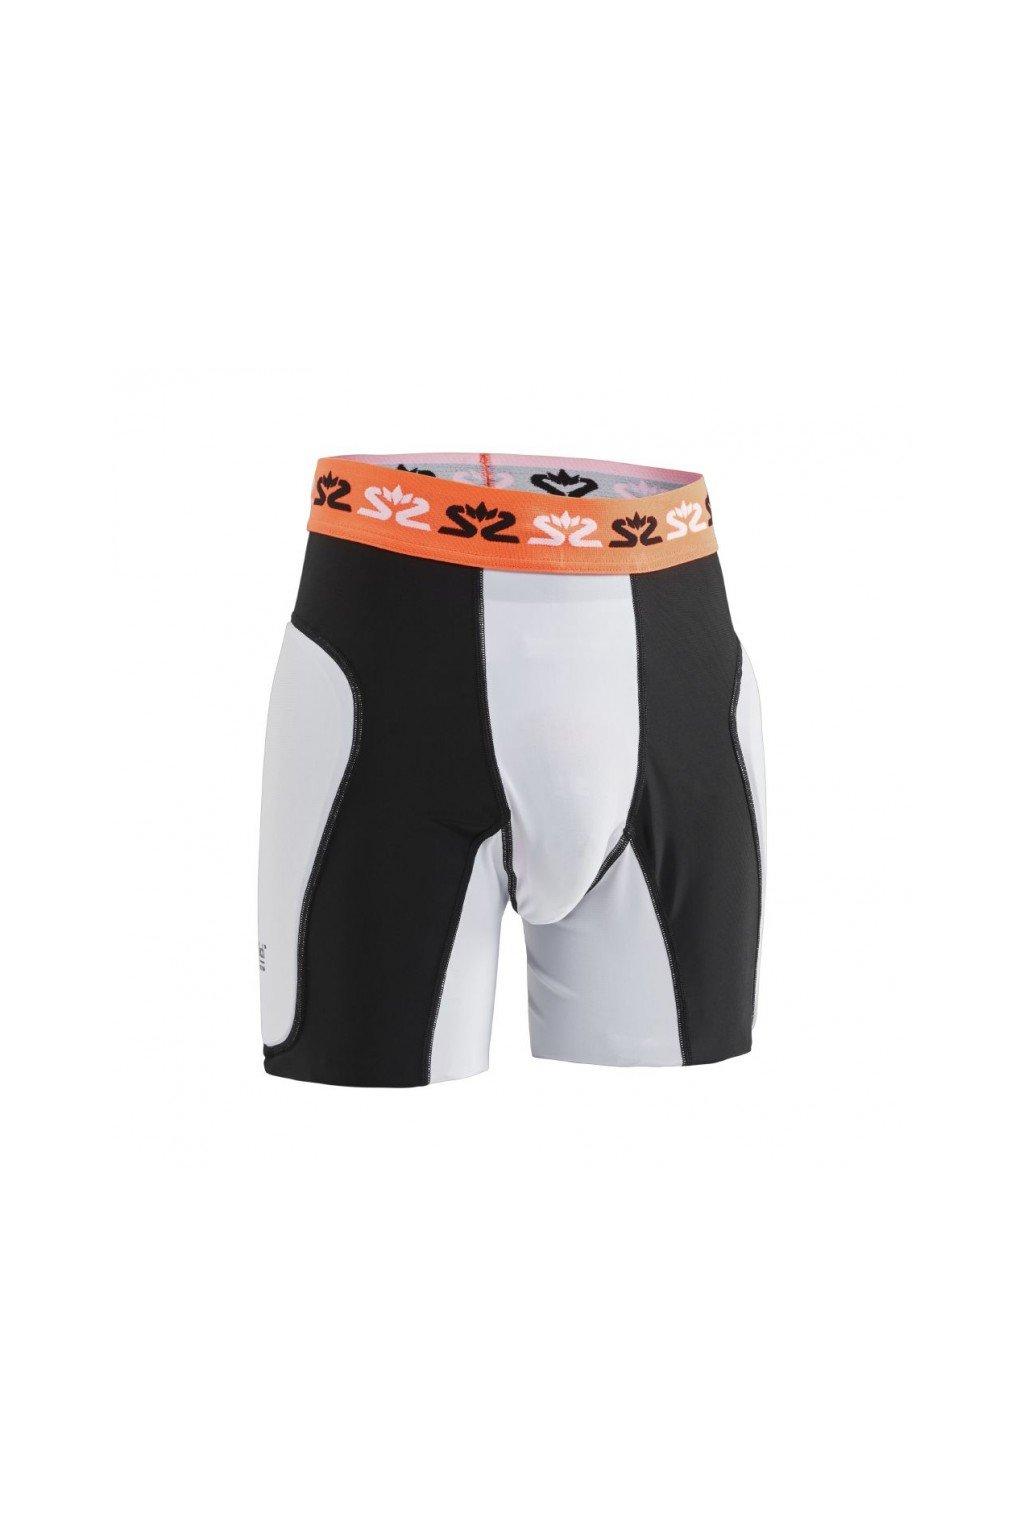 SALMING E-Series Protective Shorts White/Orange L